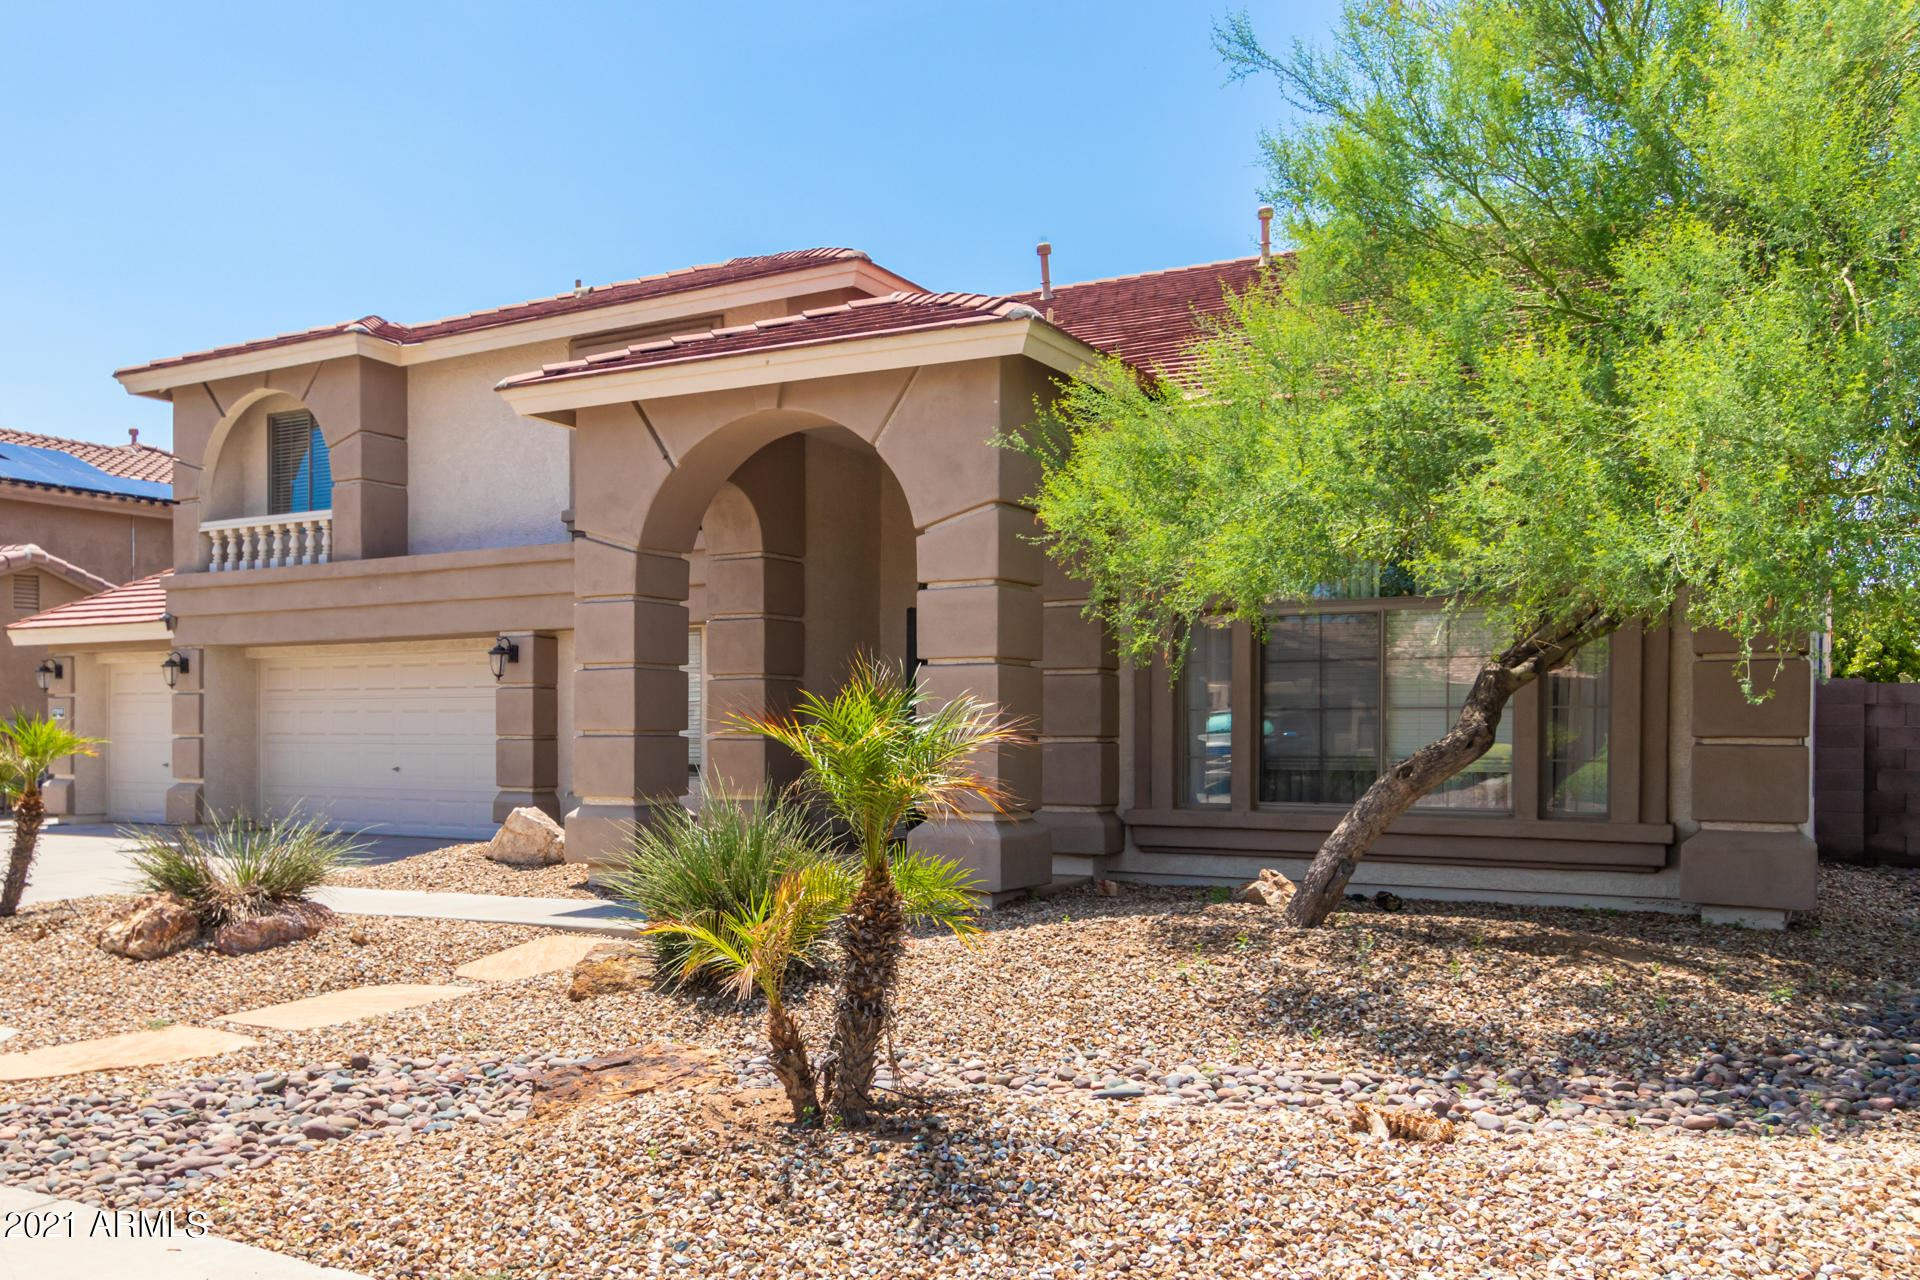 Photo of 13515 W MEDLOCK Drive, Litchfield Park, AZ 85340 (MLS # 6270508)